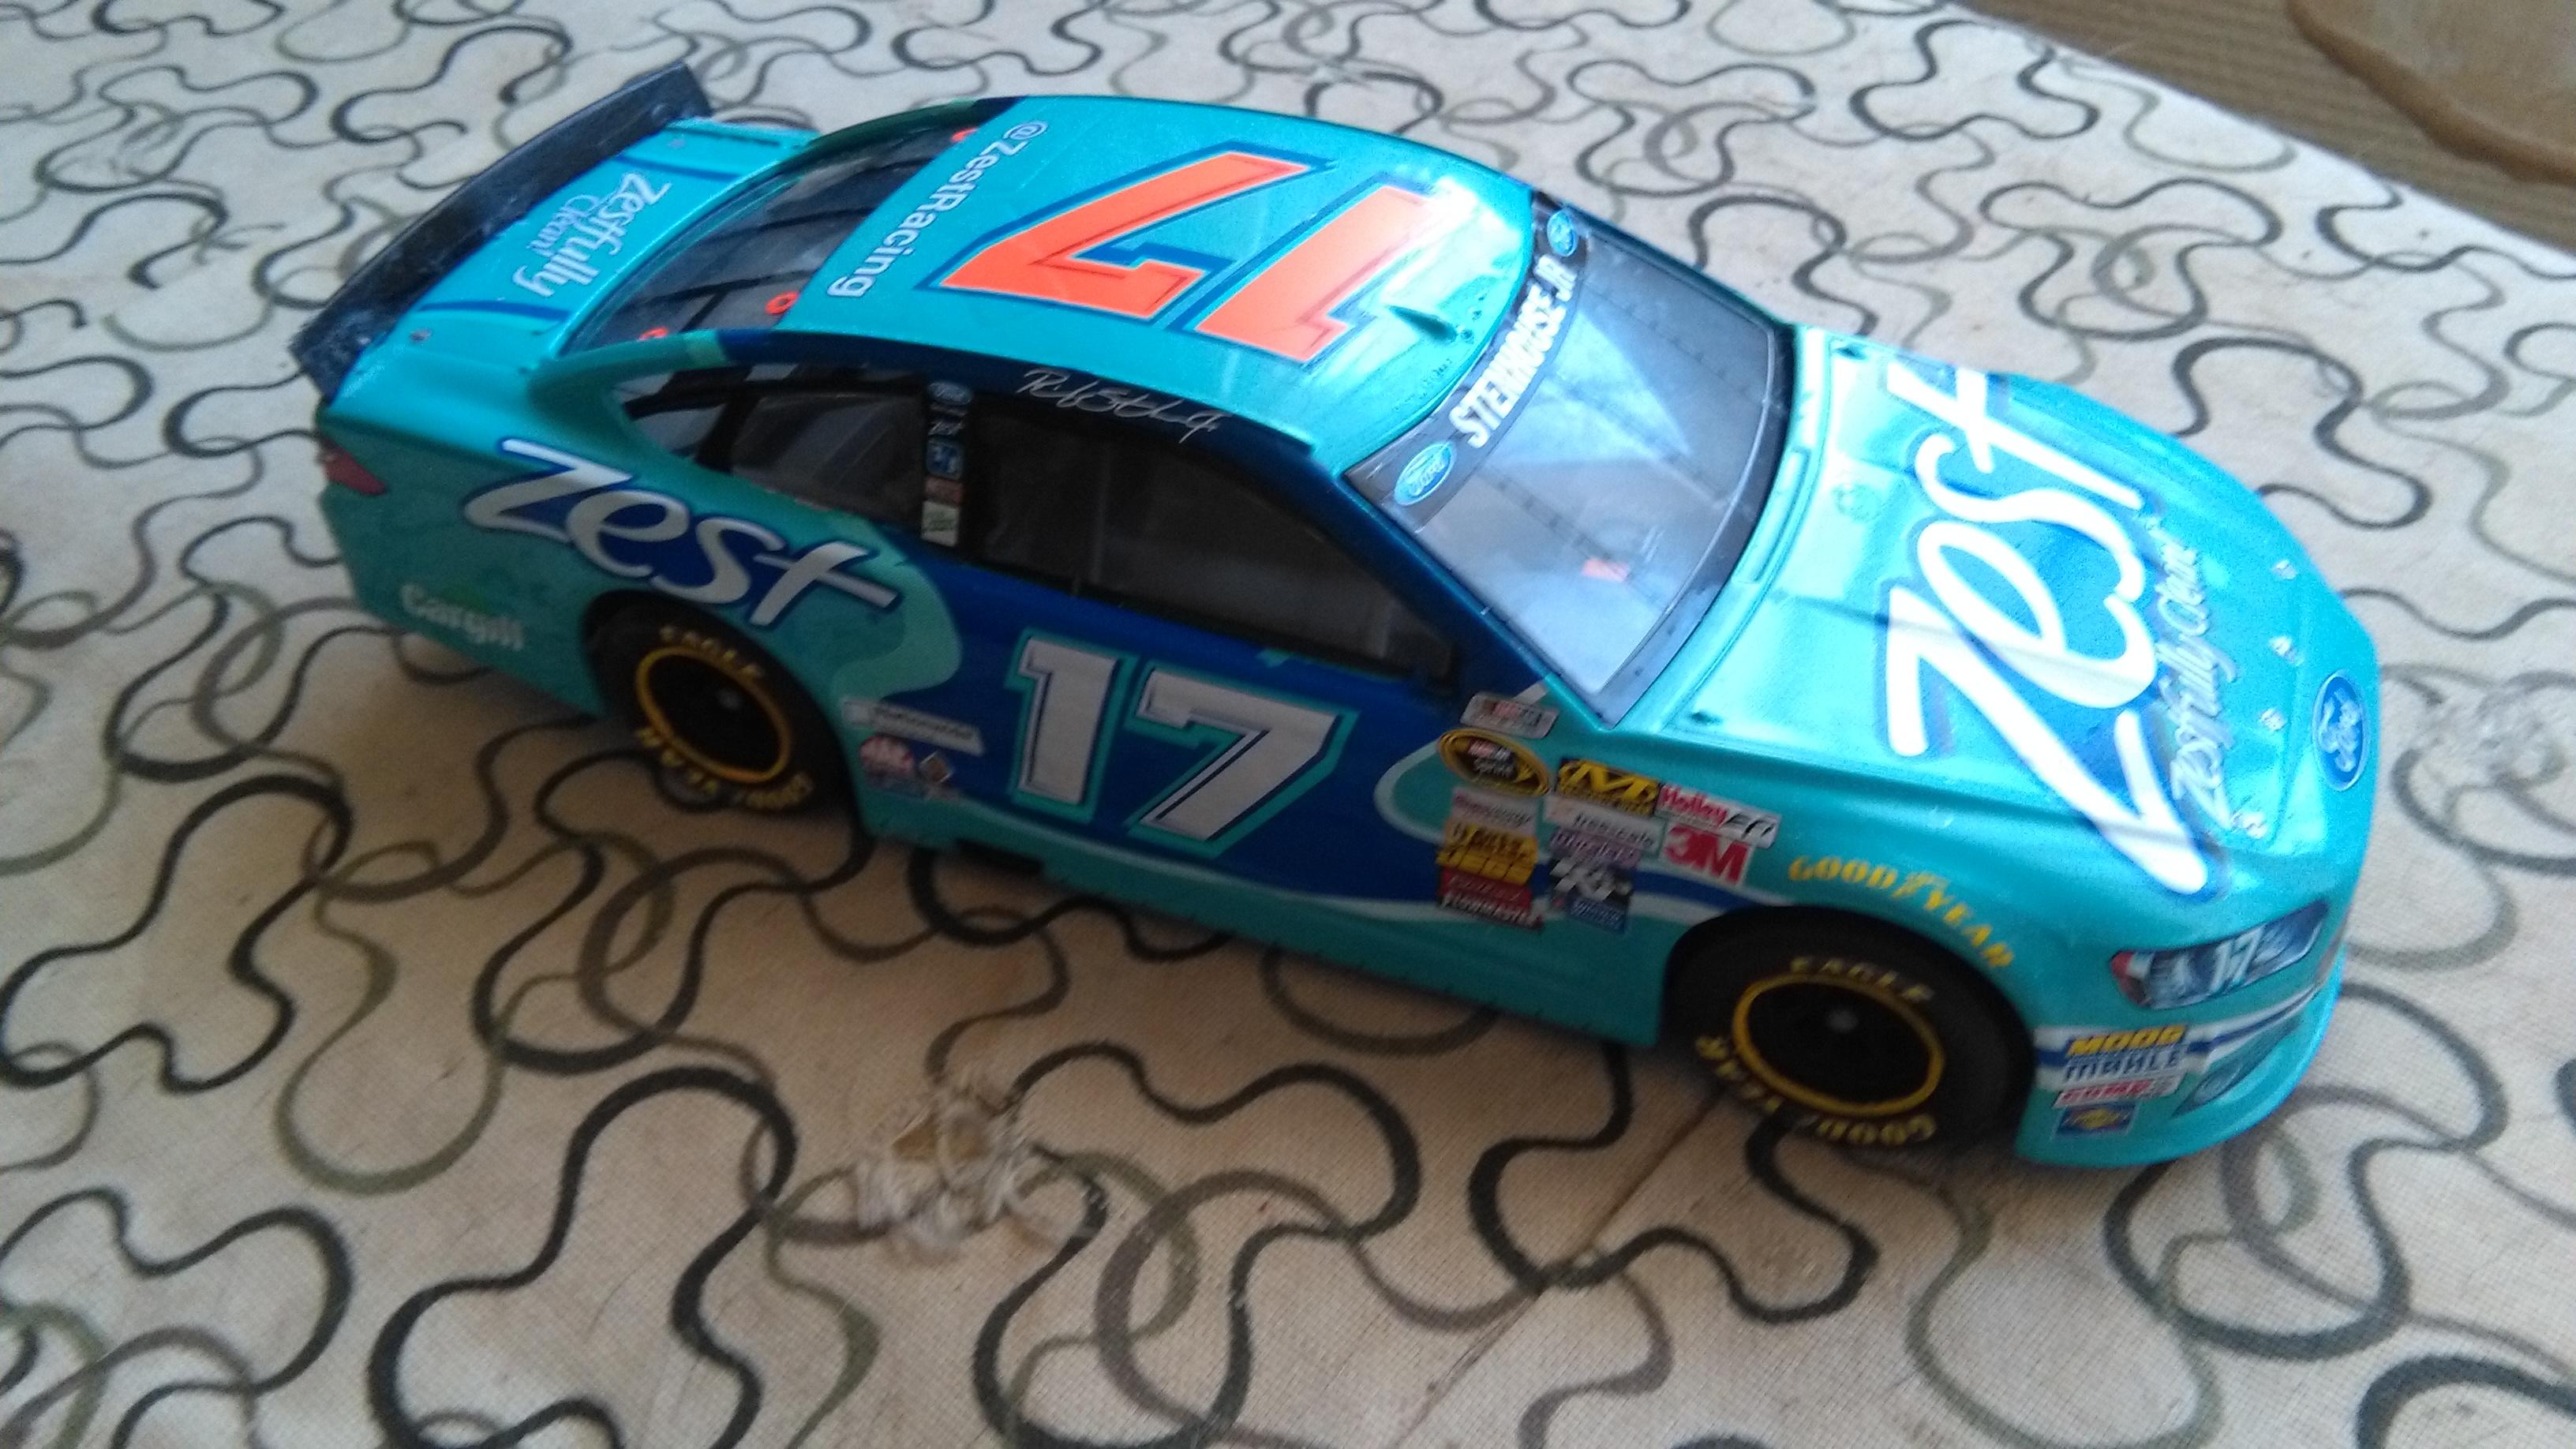 Ford Fusion Penskee 2014 #2 Brad K. Miller Lite - CHASE Version 323821IMG20160411132142